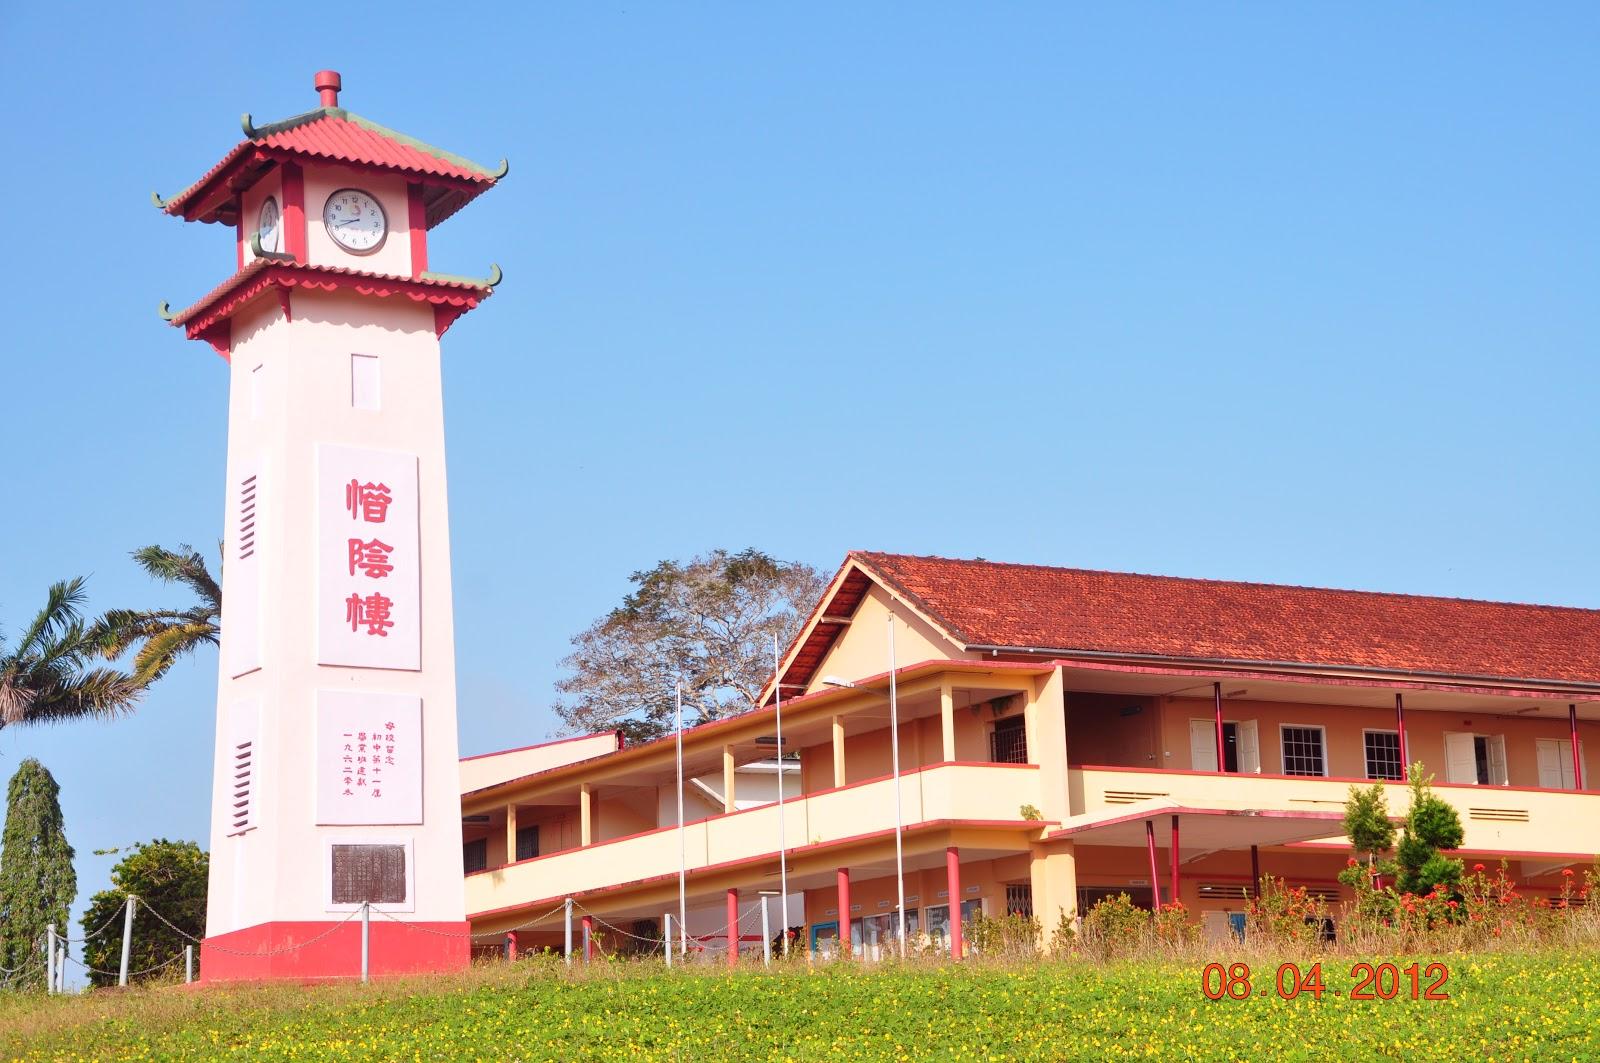 Sekolah Menengah Seg Hwa , Segamat.